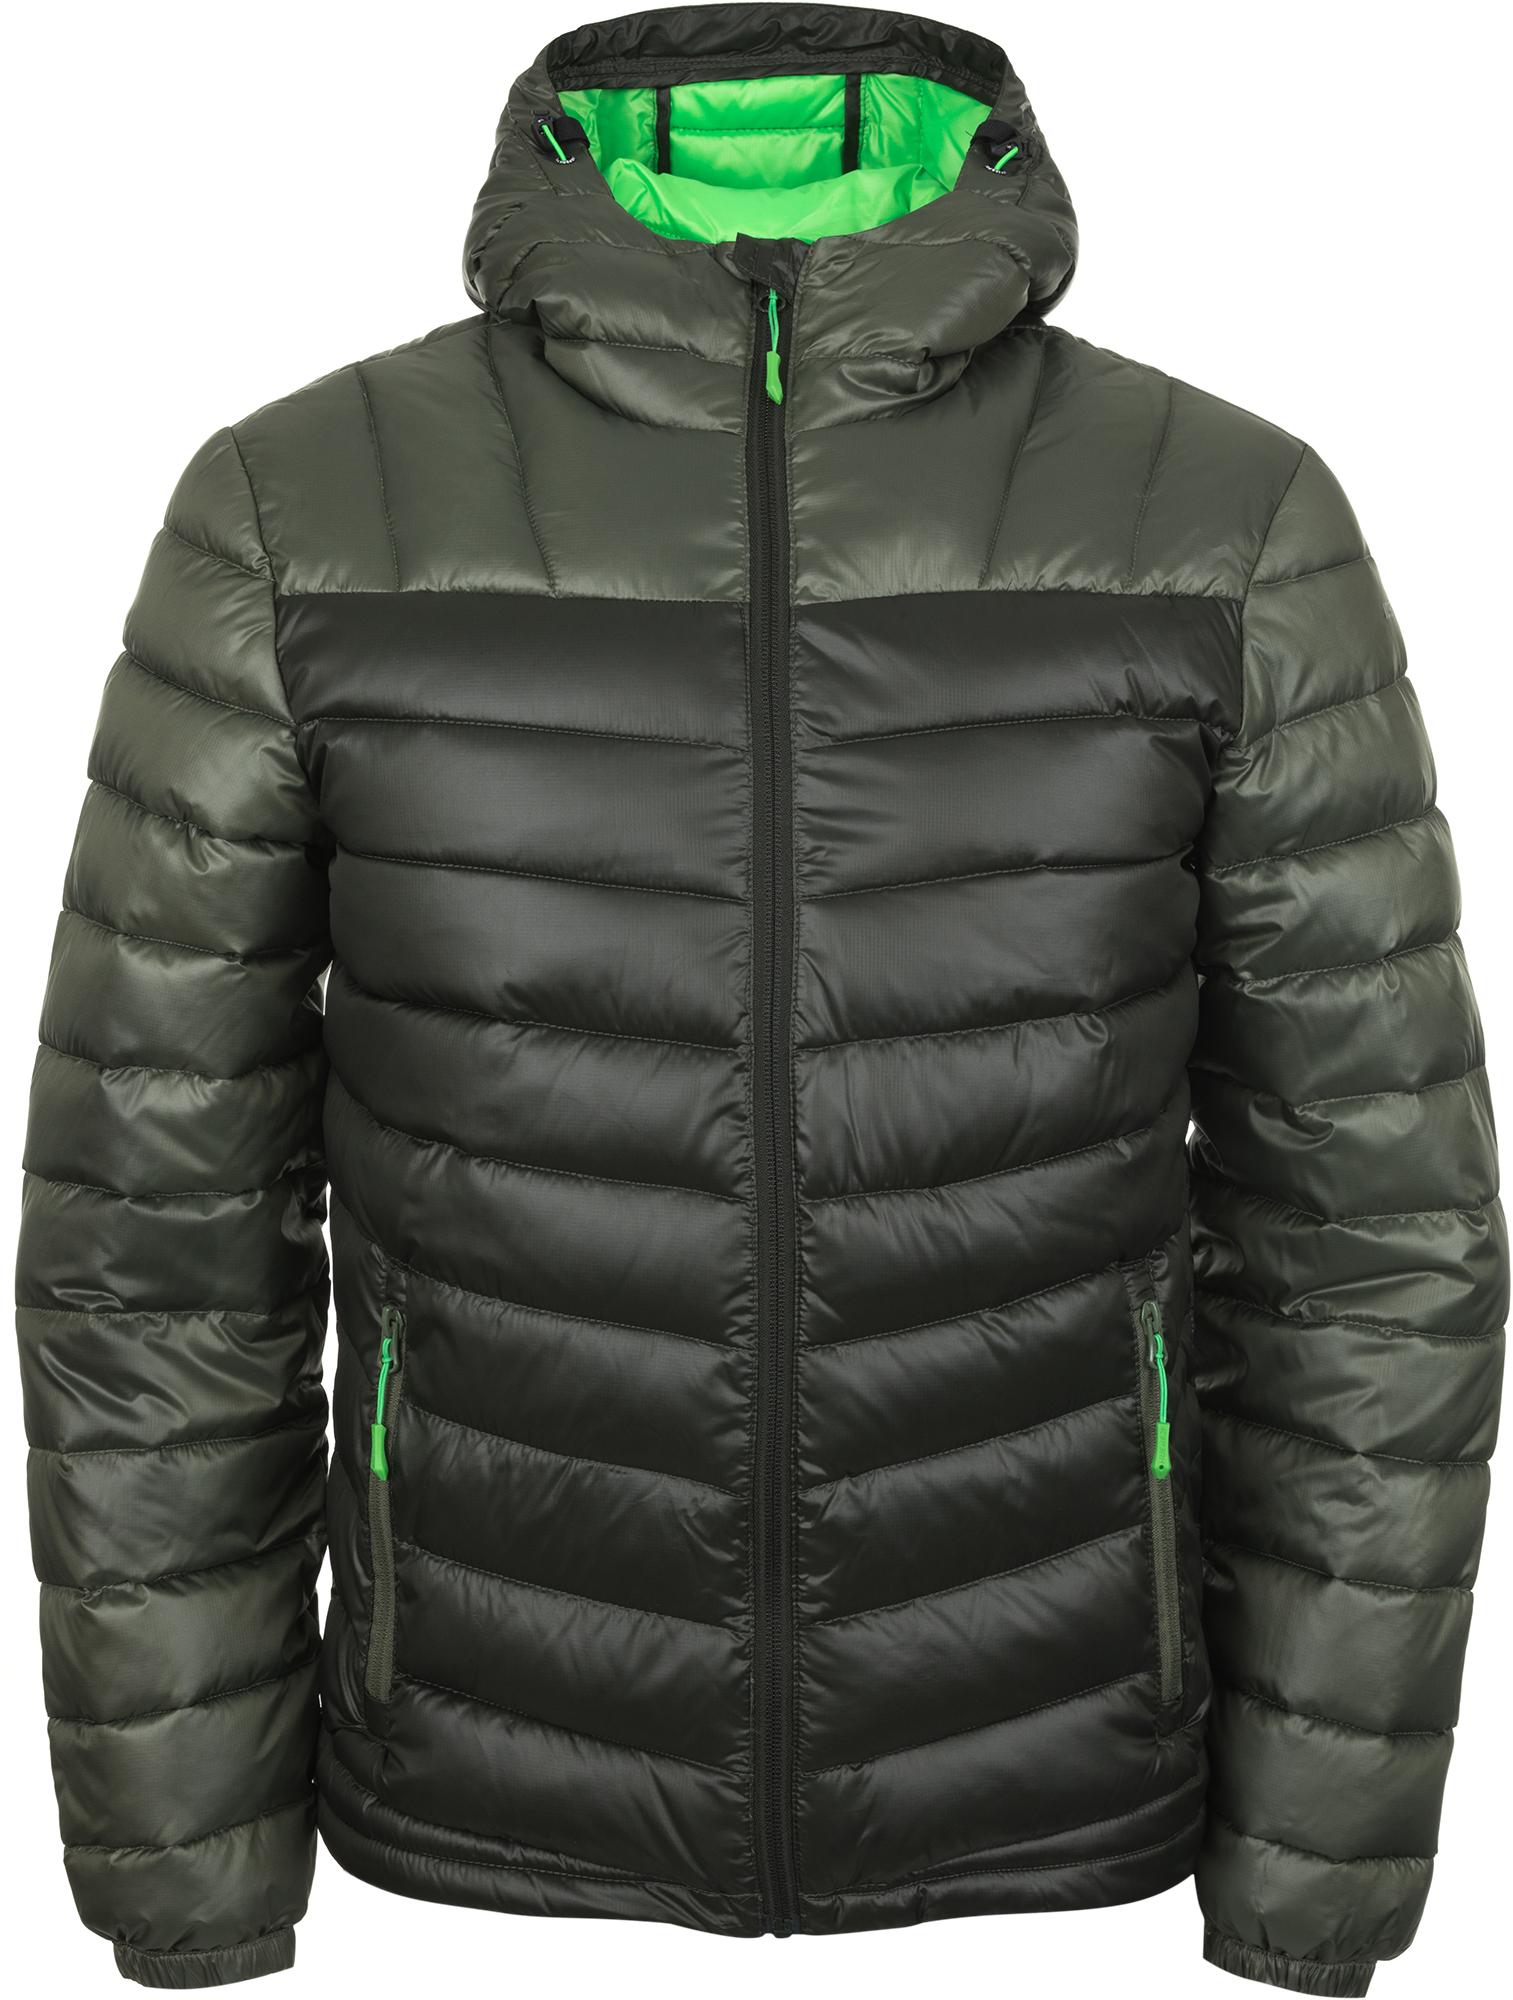 IcePeak Куртка утепленная мужская IcePeak Leal, размер 54 icepeak шапка мужская icepeak iolo размер без размера